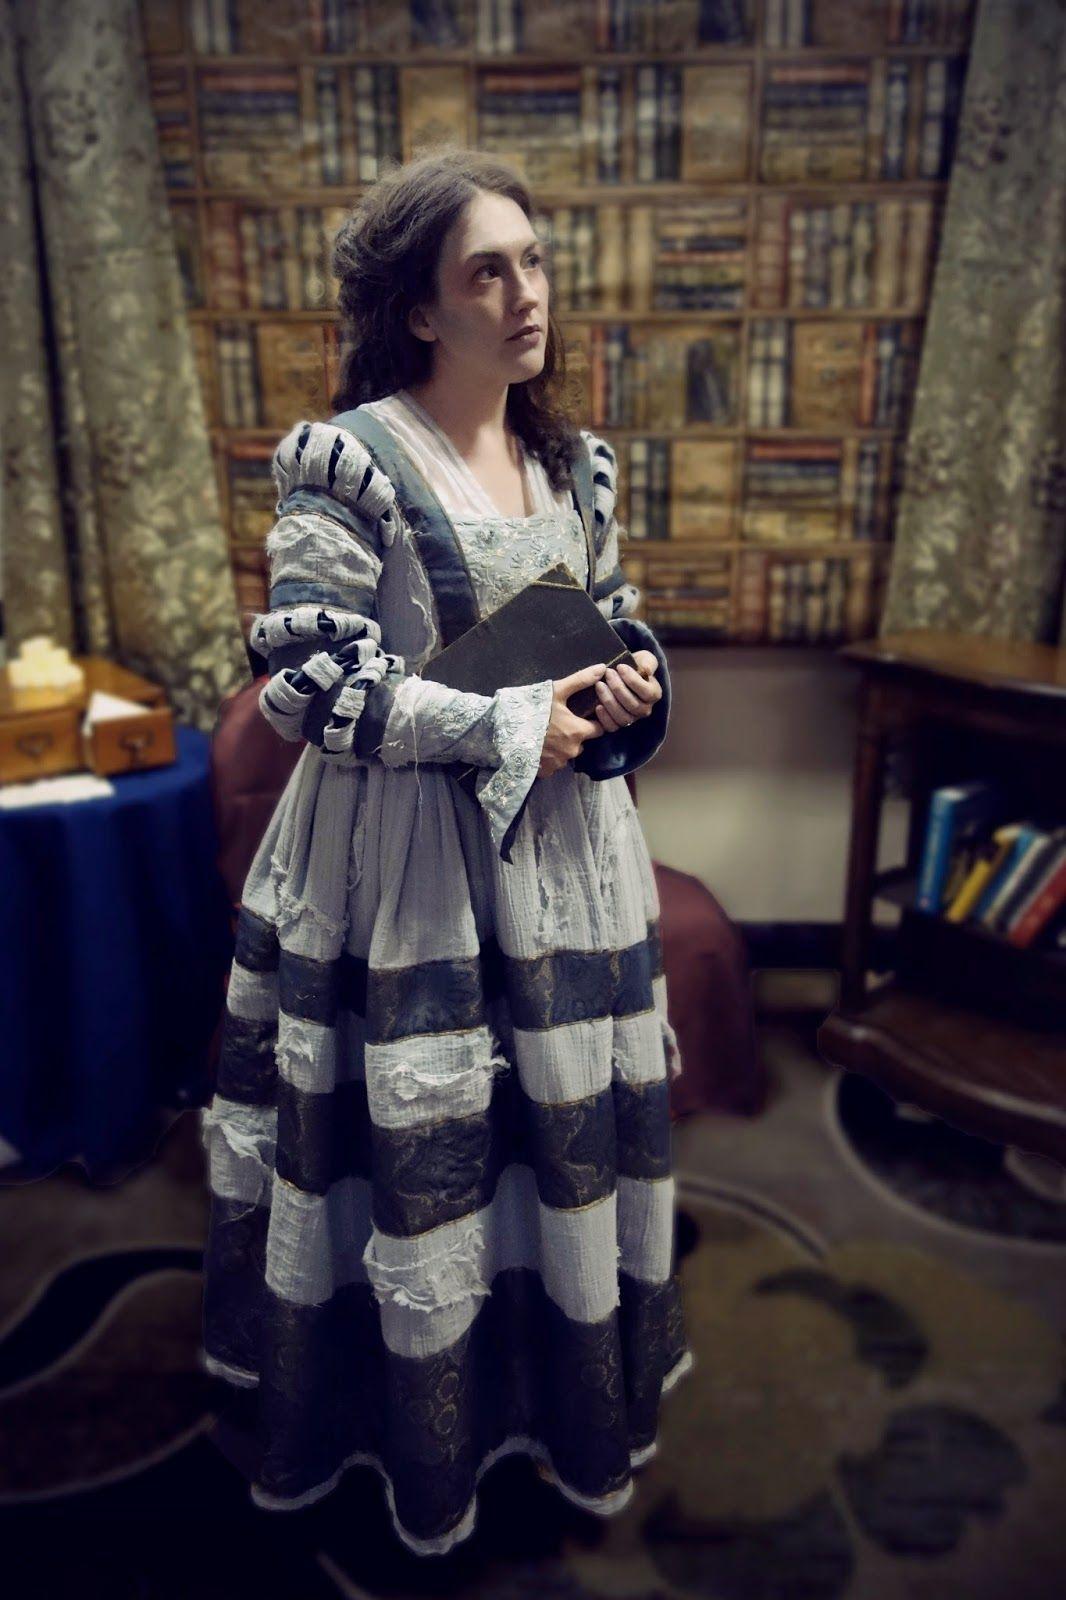 Harry Potter Lady Grey Lady Ravenclaw Costume